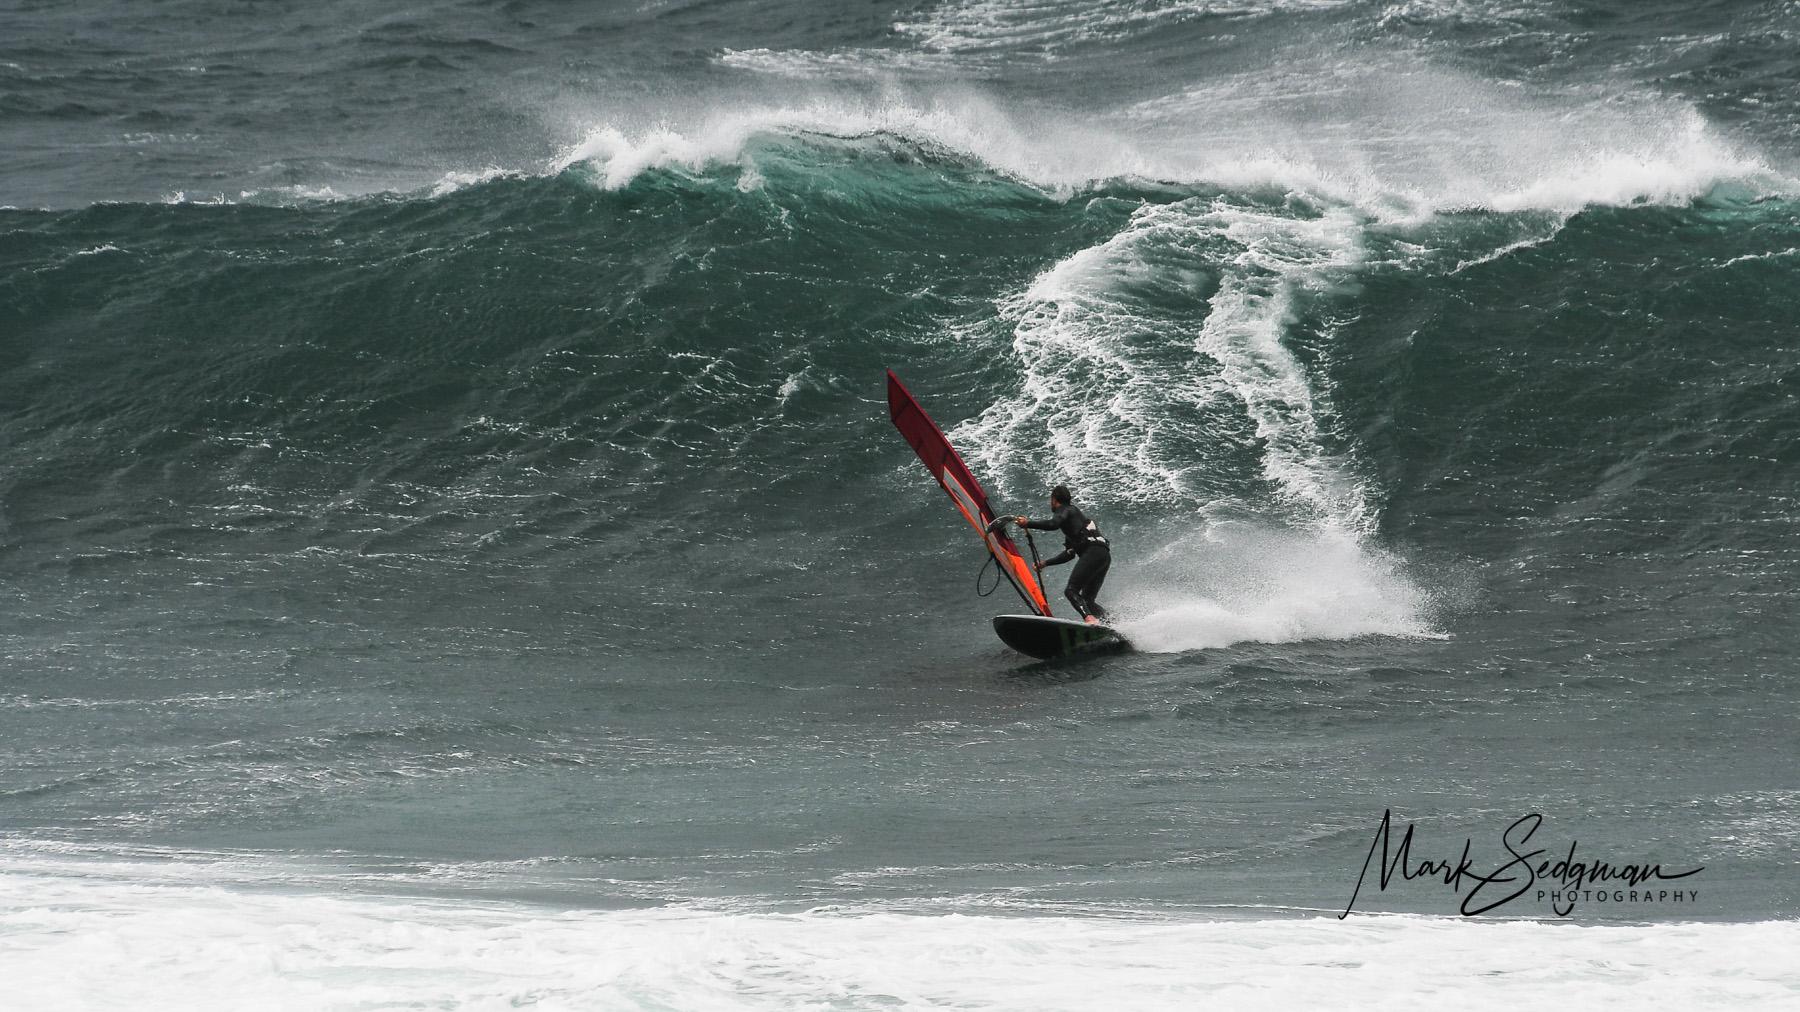 jono from surftrax windsurfing surfies point